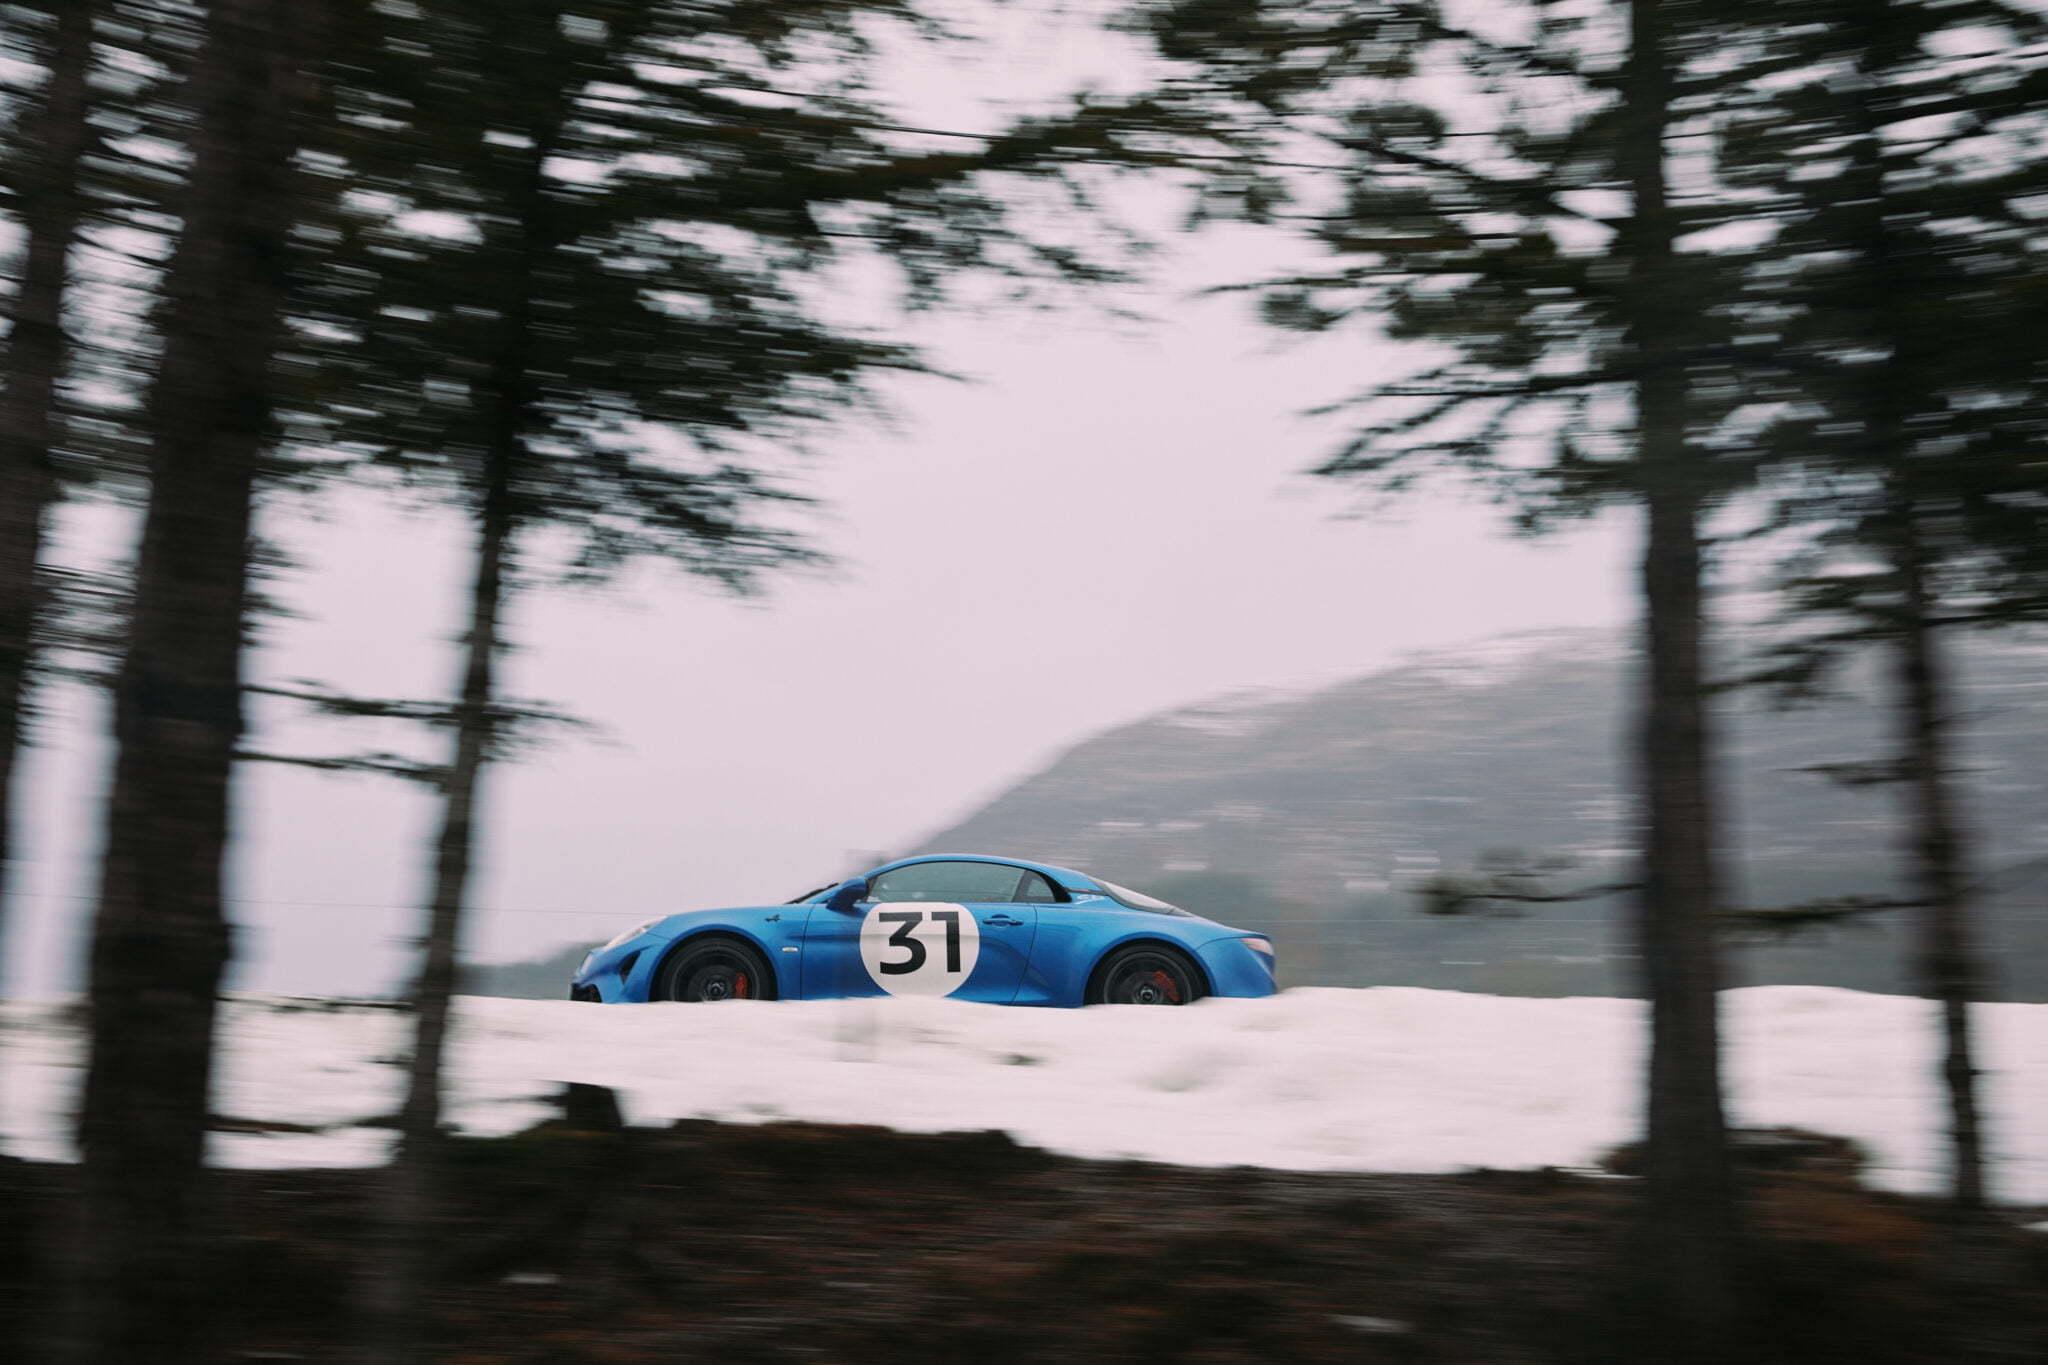 Esteban Ocon Rallye Monte Carlo 2021 Alpine A110 F1 Team 3 | Esteban Ocon s'essaye à l'Alpine A110S au Rallye Monte-Carlo